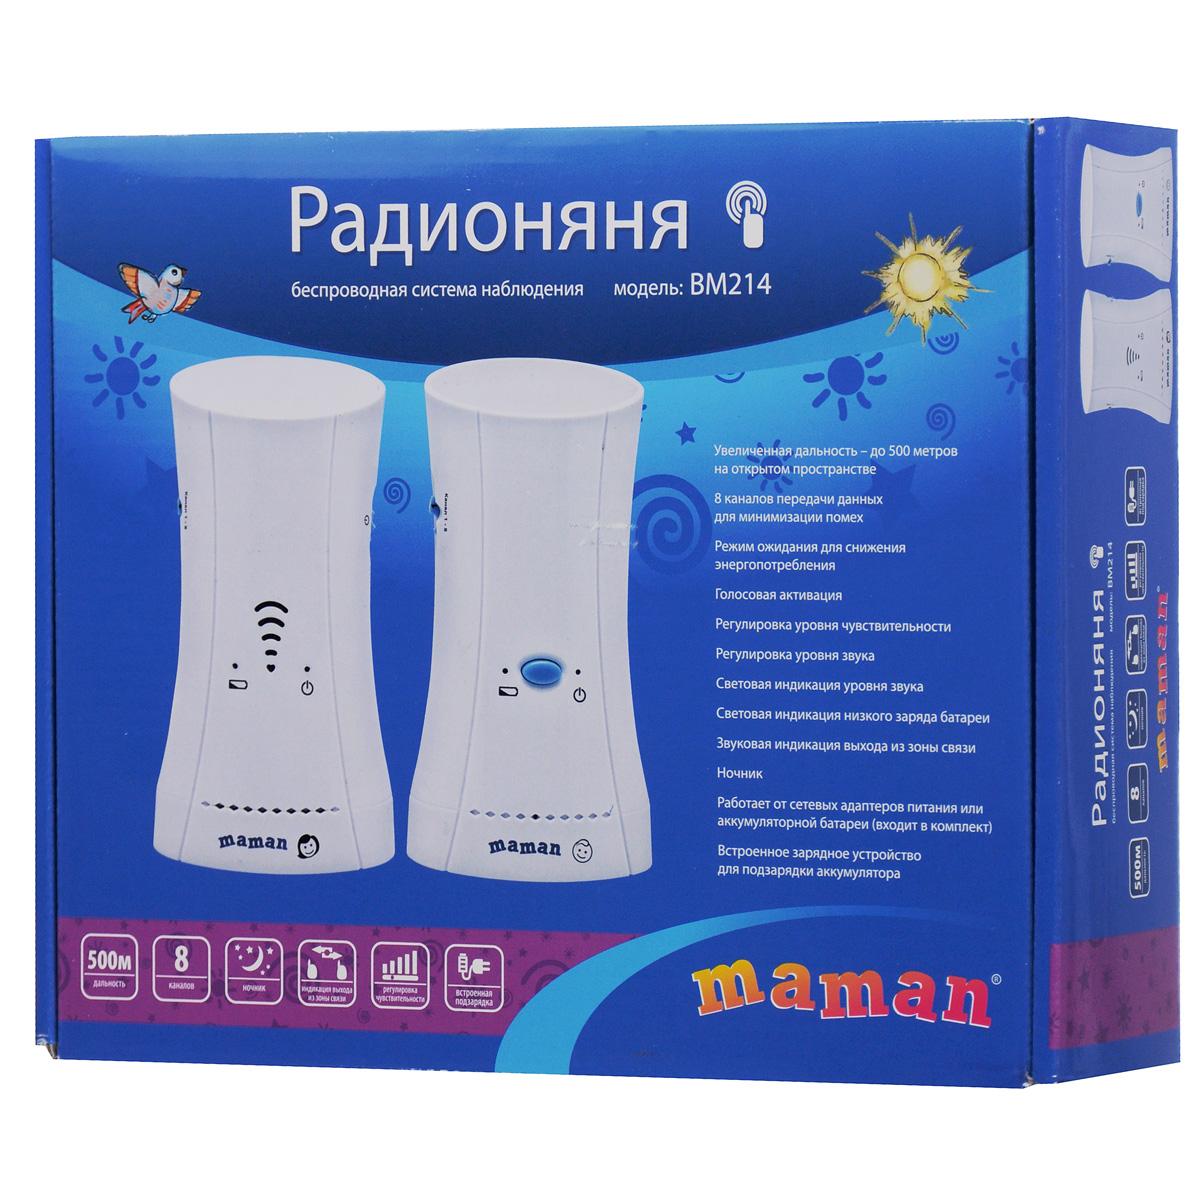 Радионяня maman ВМ 214